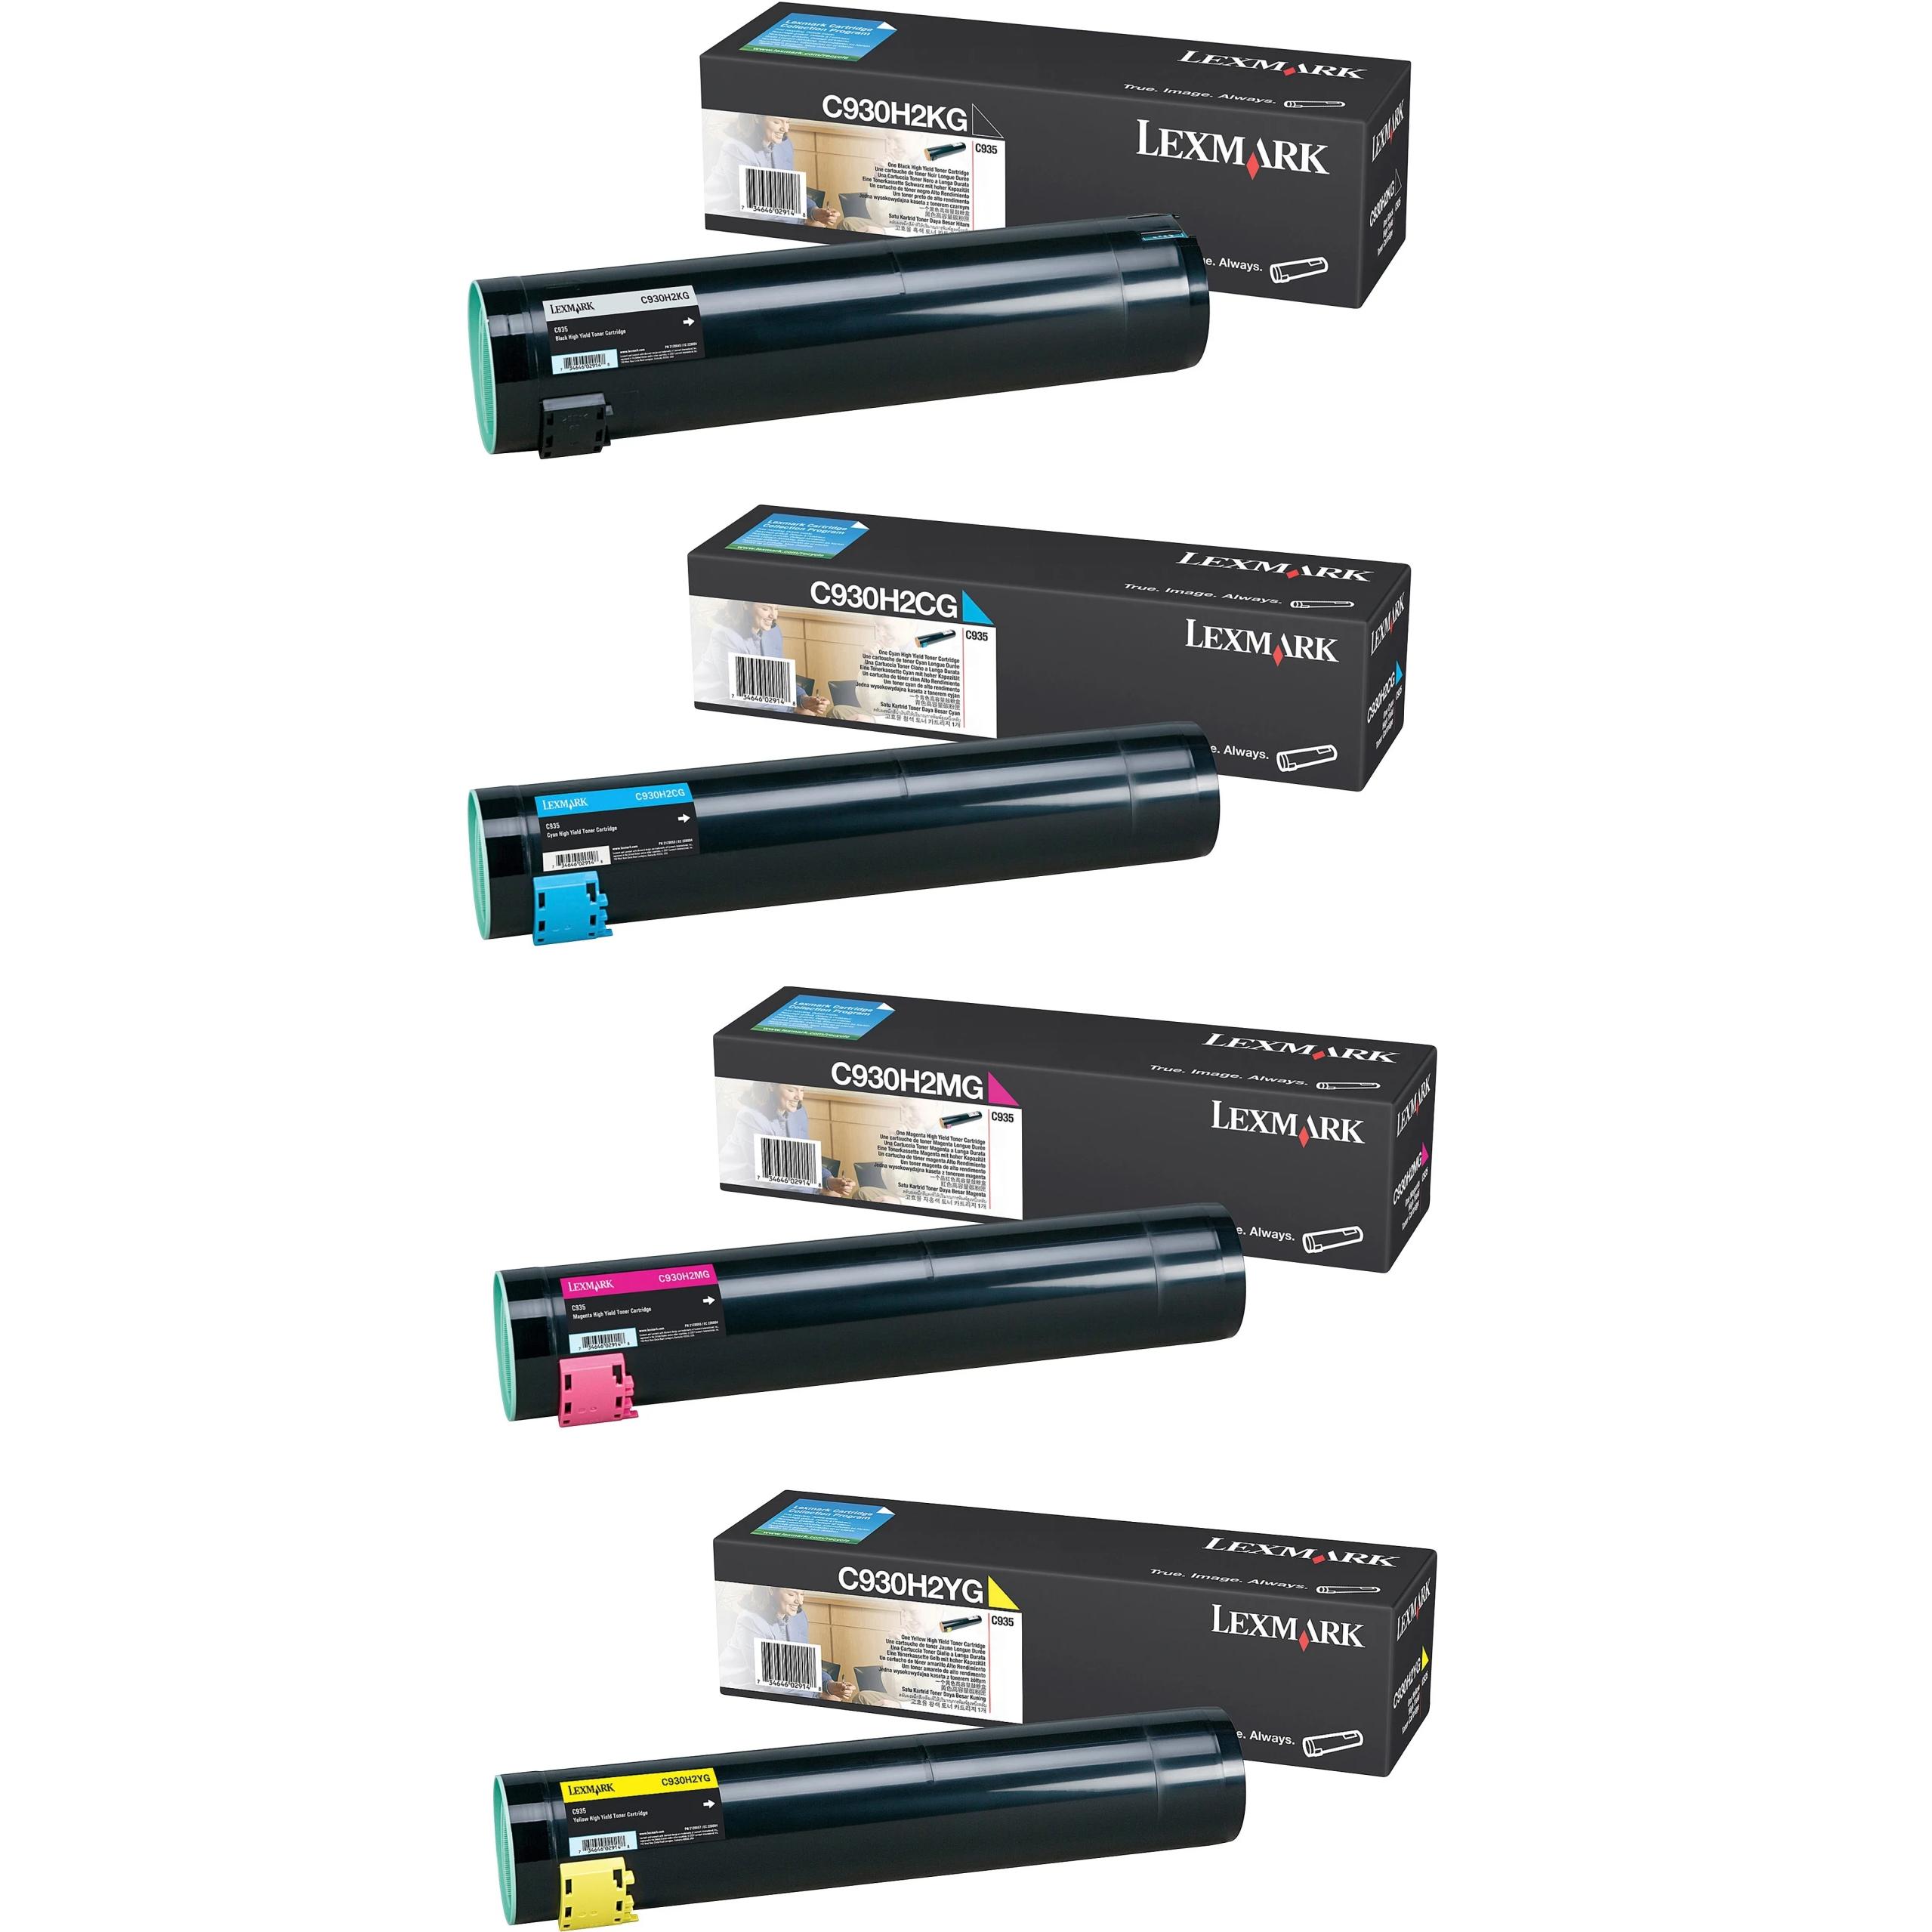 Lexmark C930H2 Set | C930H2CG C930H2KG C930H2MG C930H2YG | Original Lexmark High-Yield Toner Cartridges – Black, Cyan, Magenta, Yellow